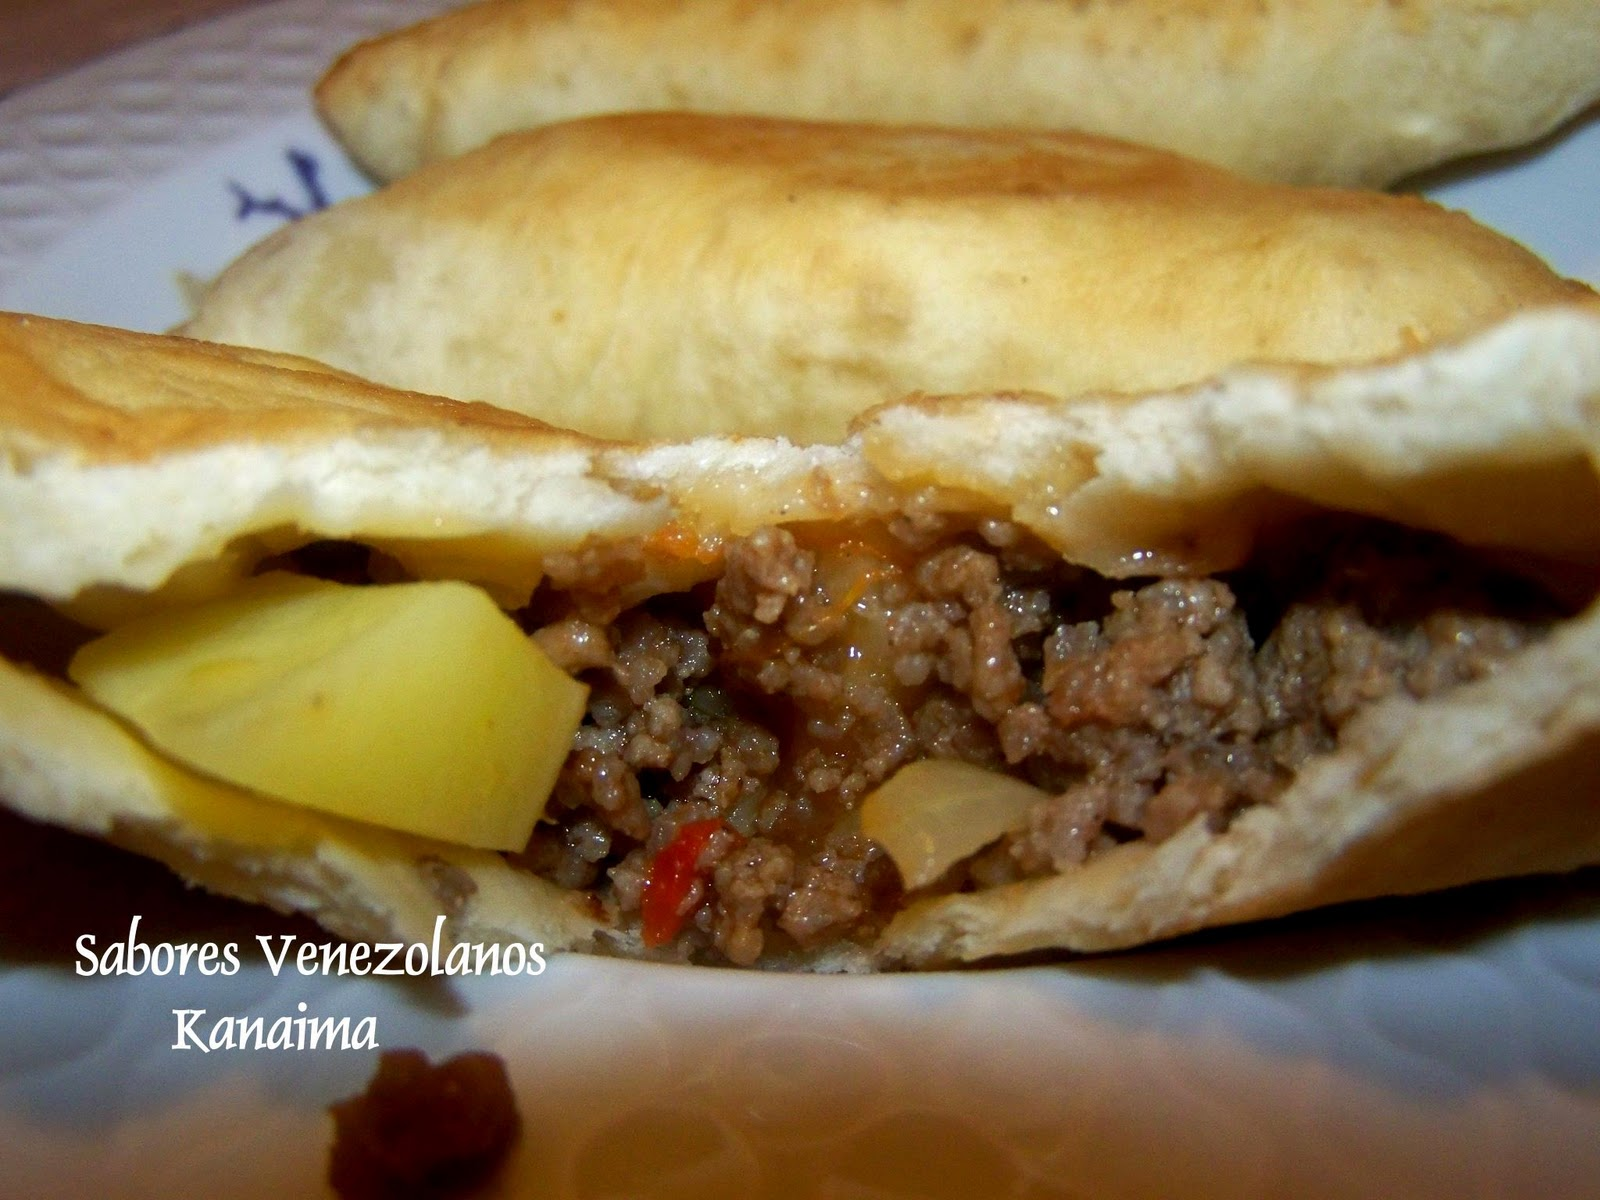 Sabores Venezolanos Pastelitos Andinos De Carne Con Papas